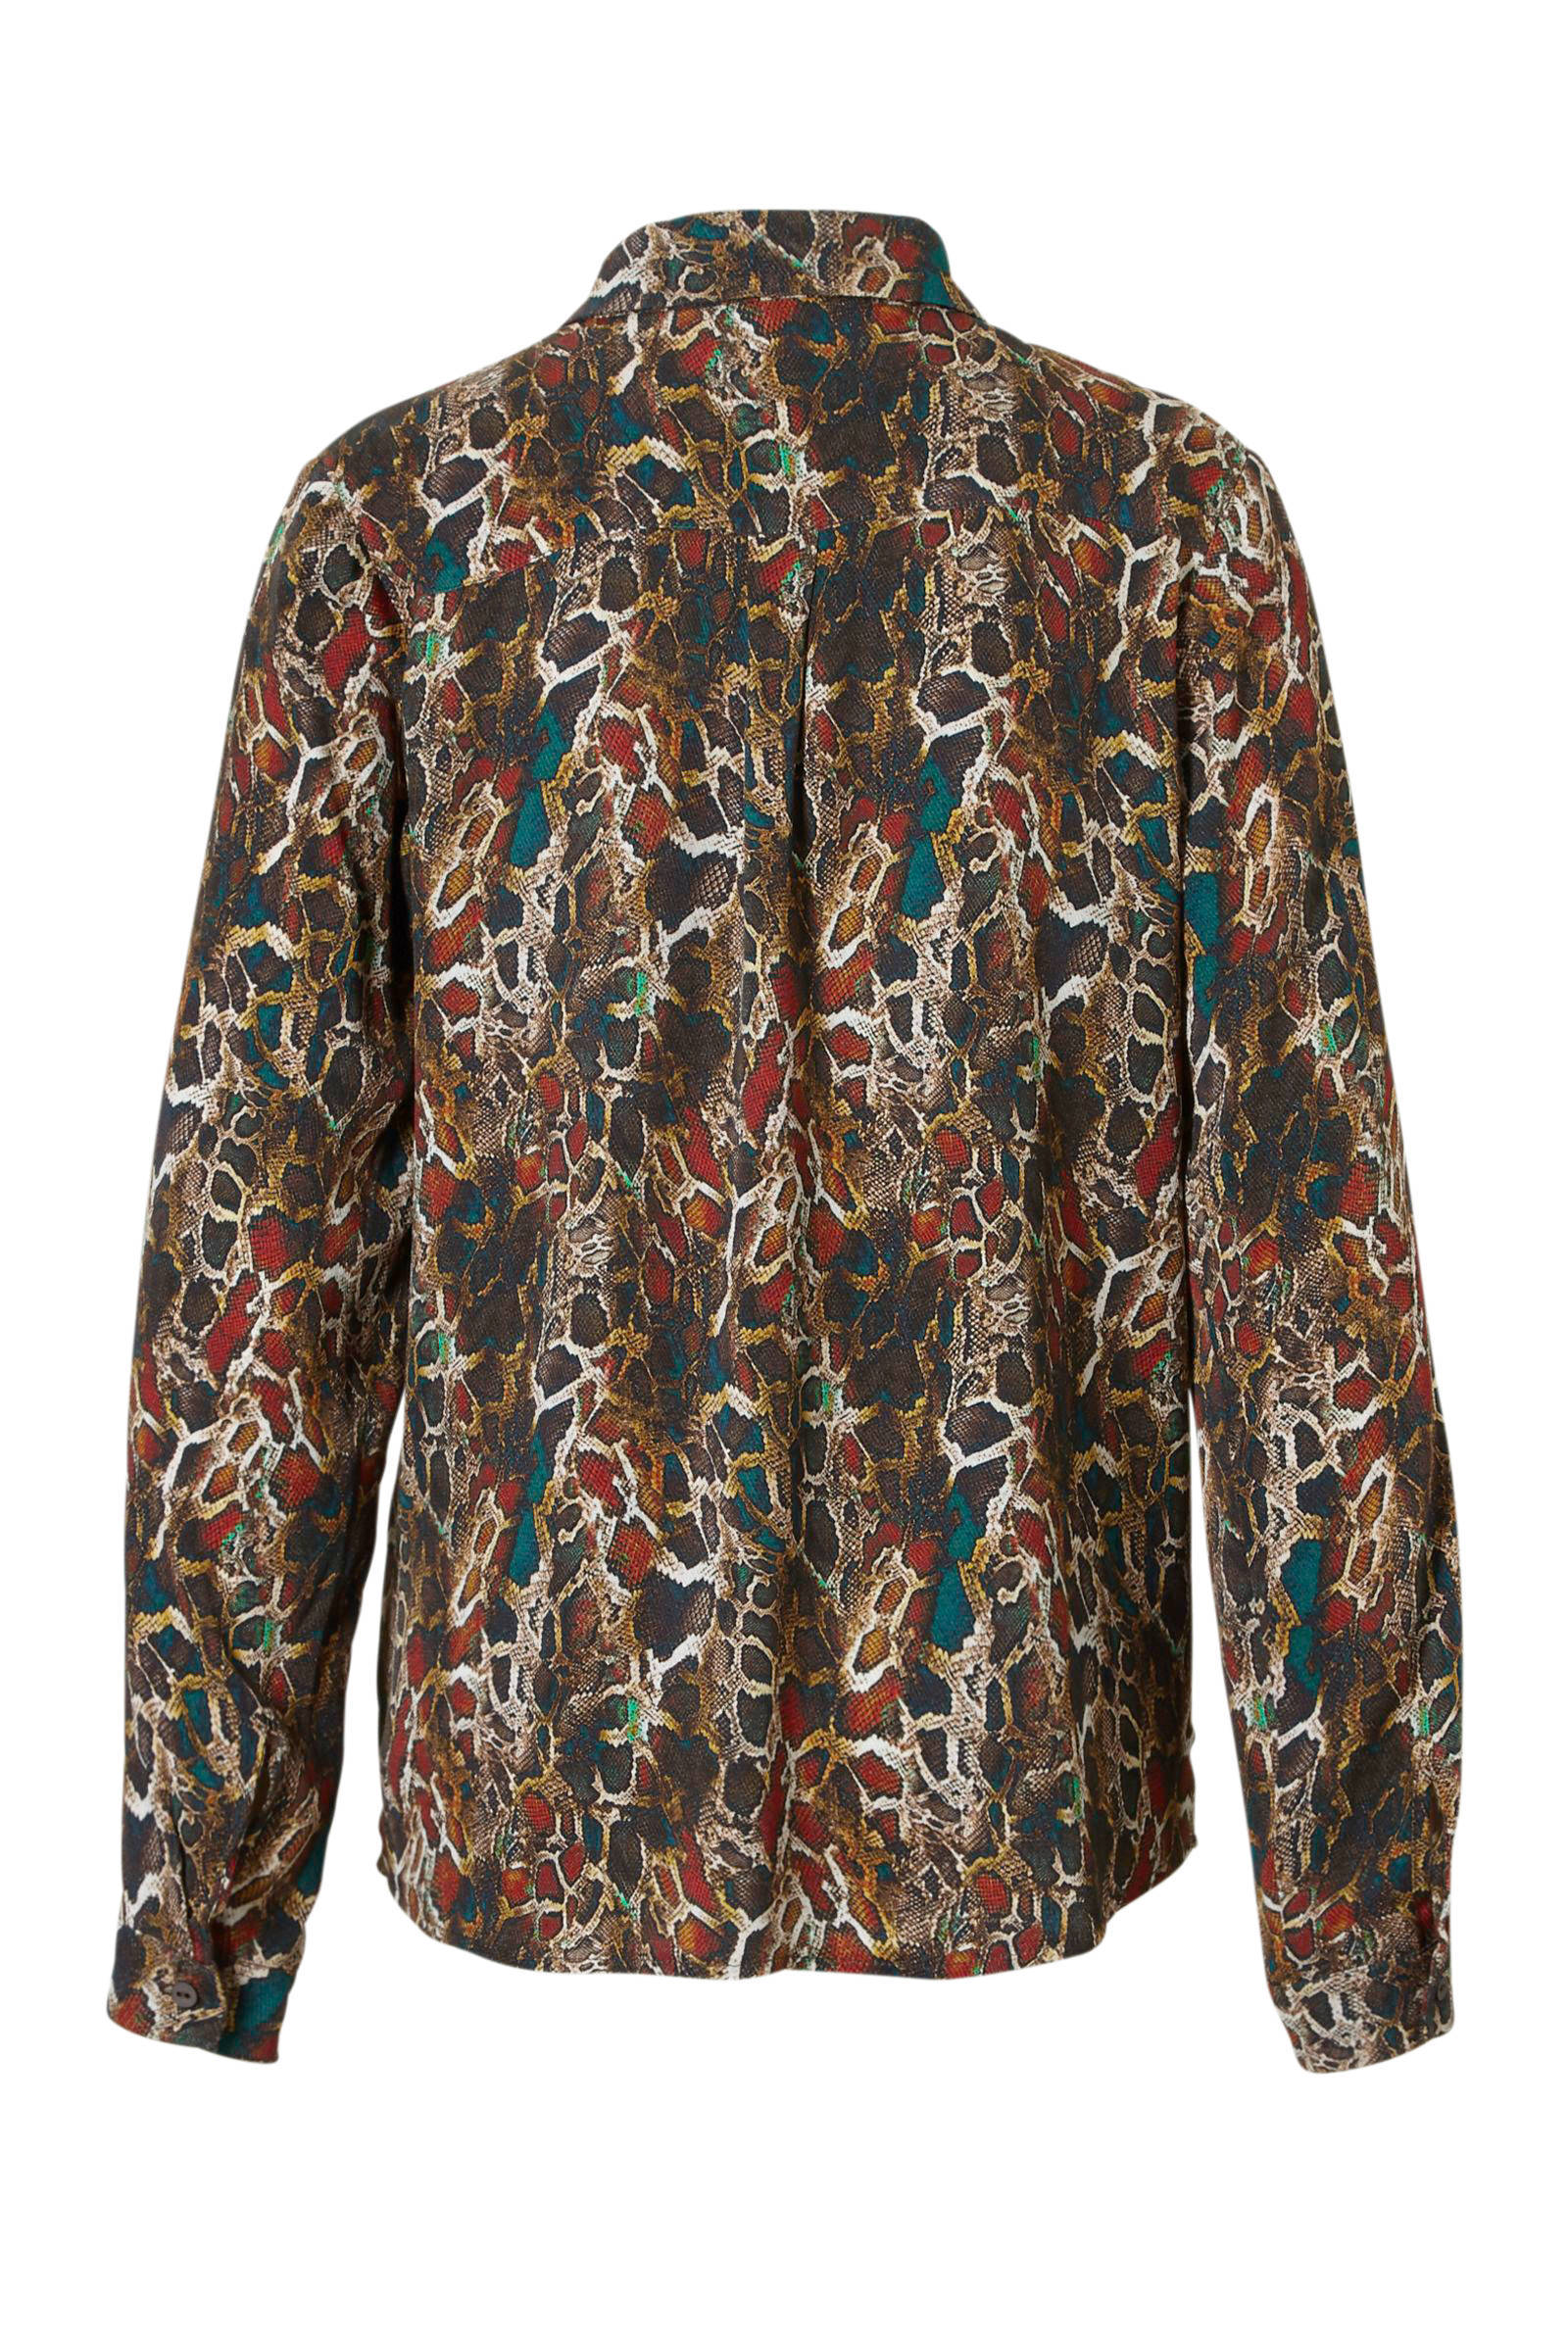 slangenprint slangenprint blouse blouse blouse met slangenprint Geisha Geisha Geisha Geisha slangenprint blouse met met met Geisha U1Anw0Z